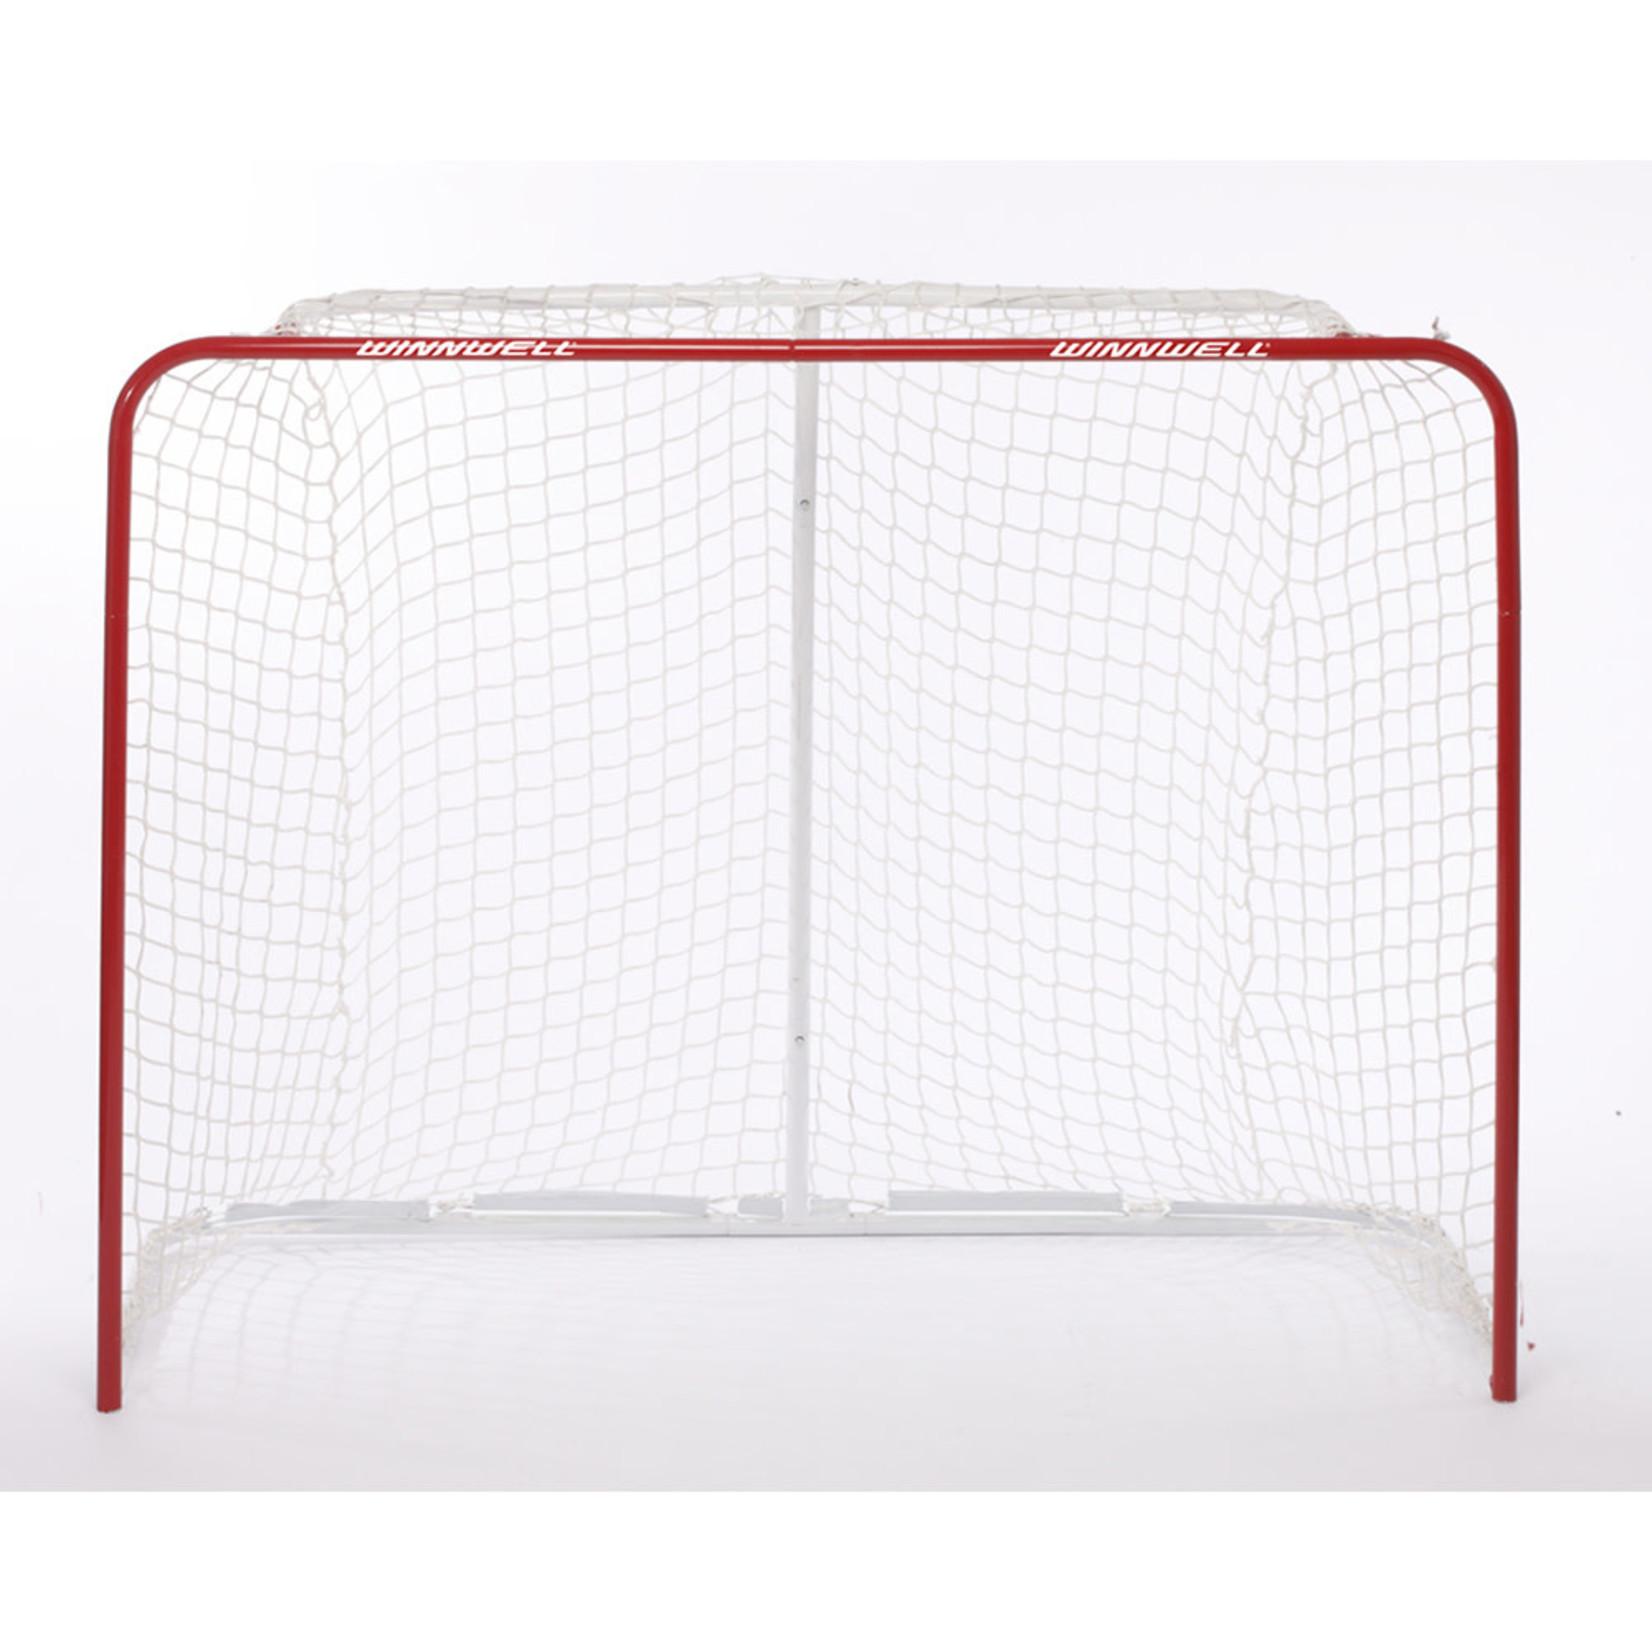 "Hockey Canada Hockey Canada Hockey Net, 54"" w/ 1"" Posts"